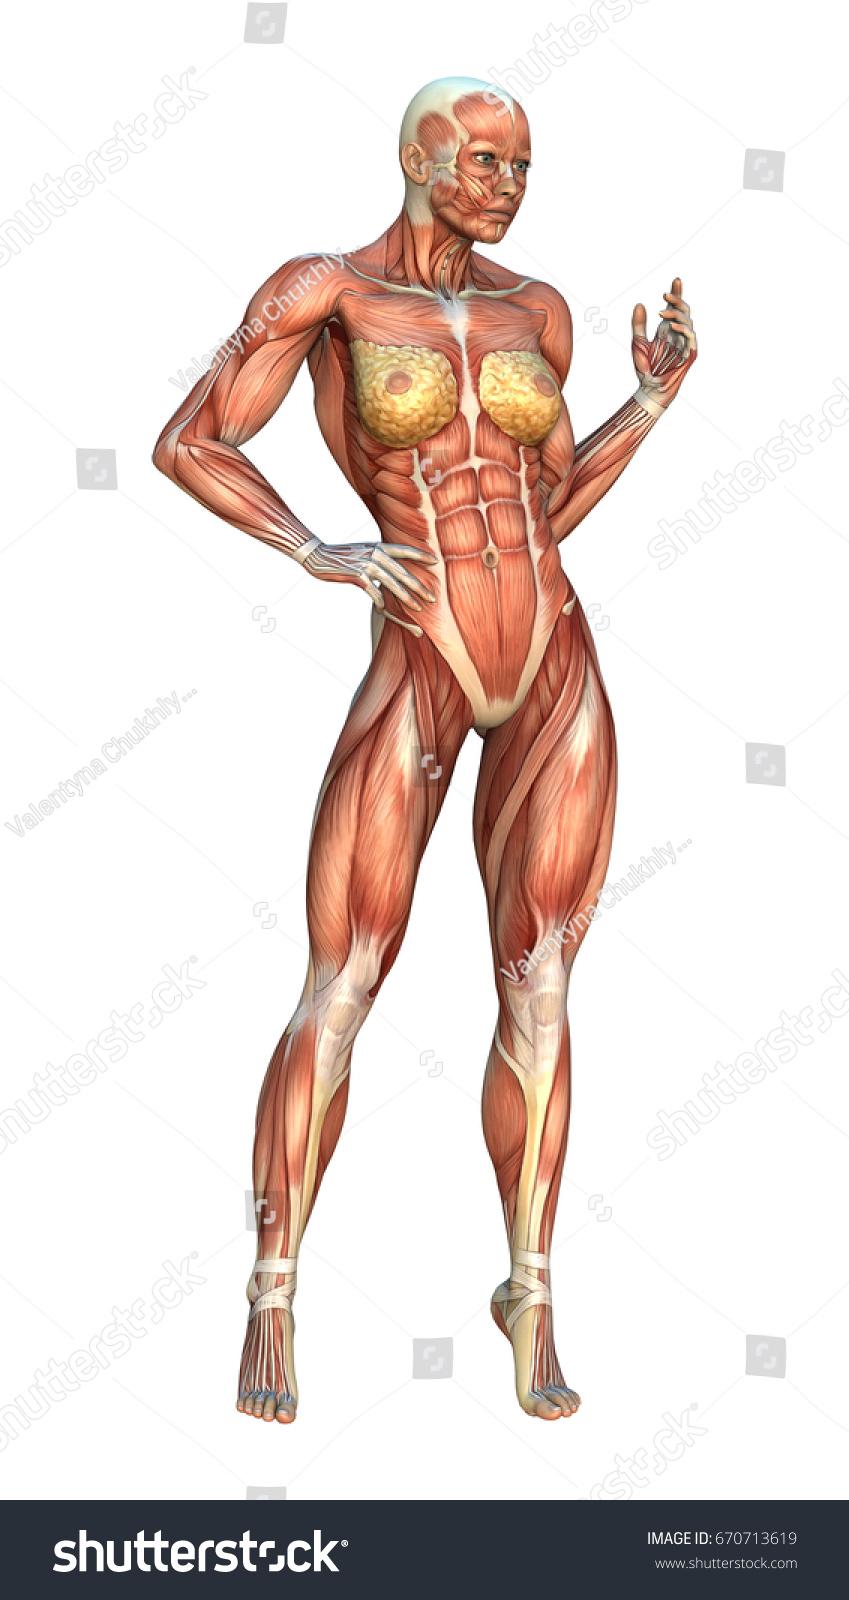 3 D Rendering Female Figure Muscle Maps Stock Illustration 670713619 ...